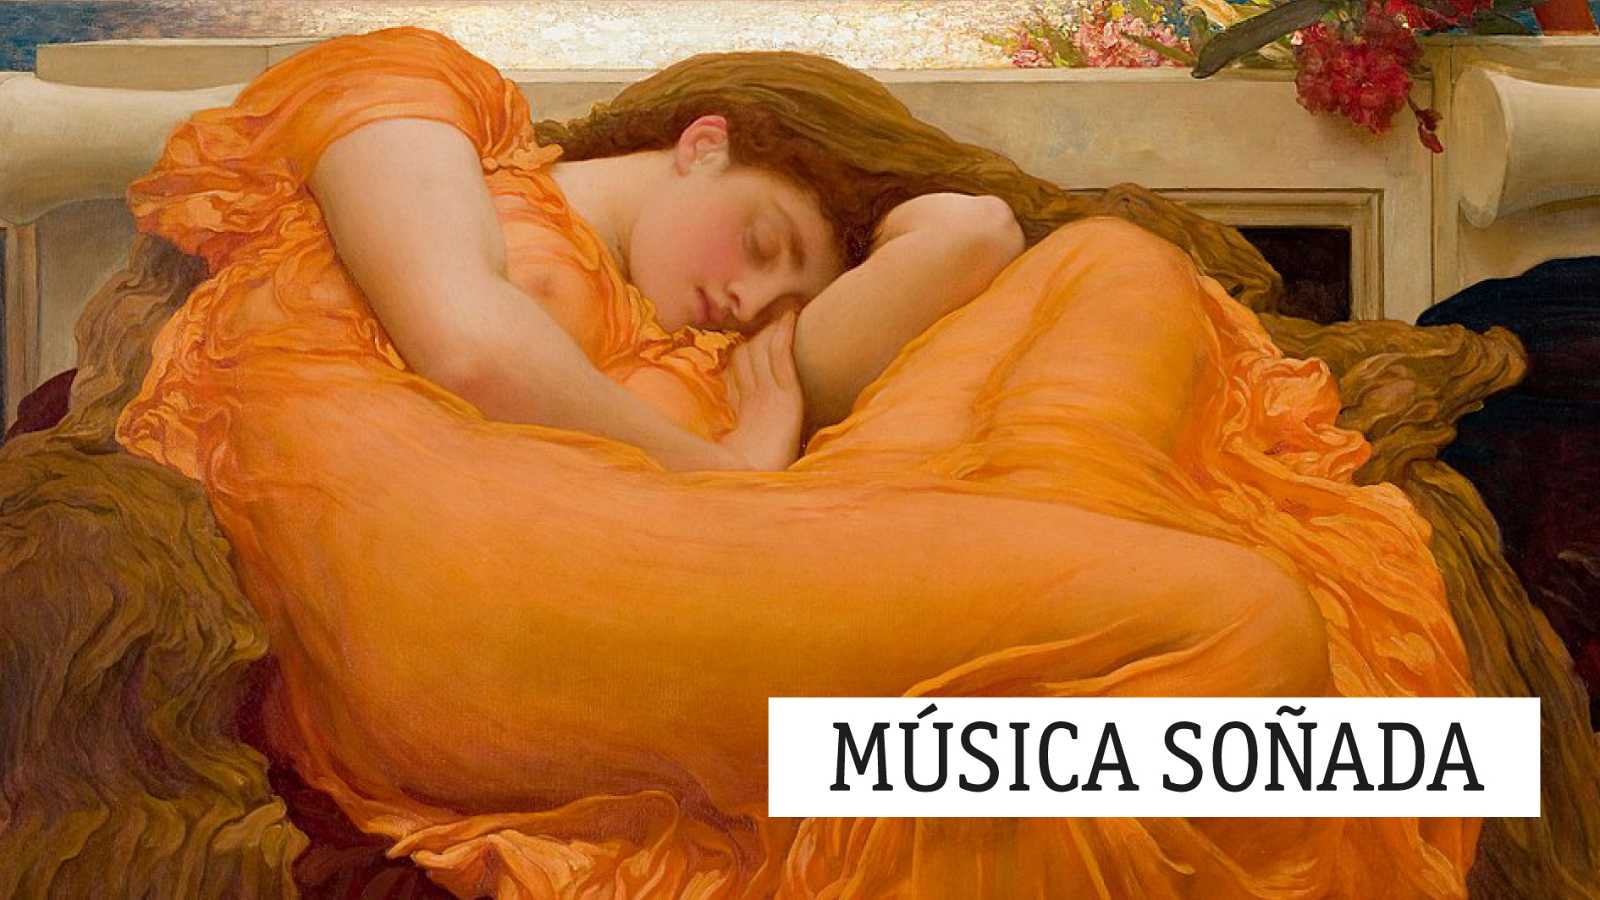 Música soñada - Ventanas - 14/11/20 - escuchar ahora